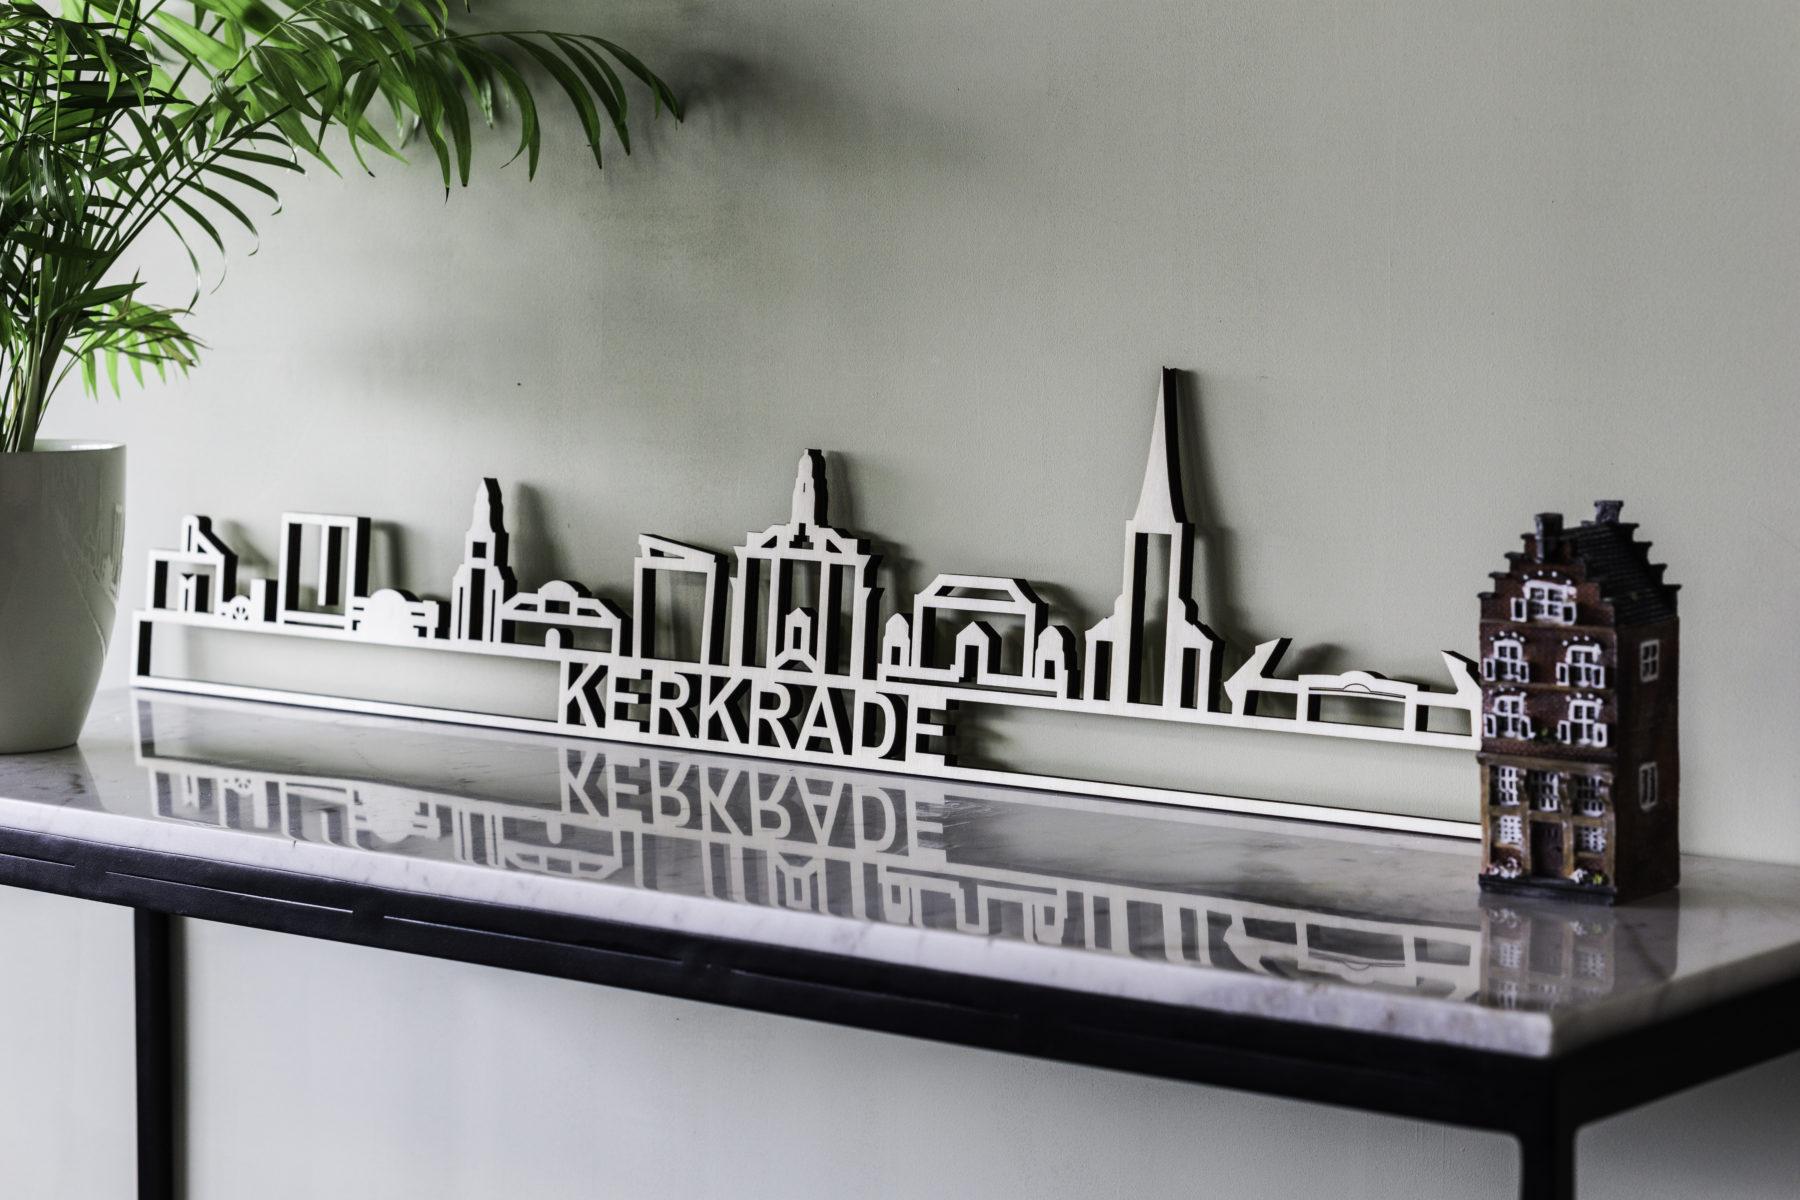 populieren houten skyline Kerkrade